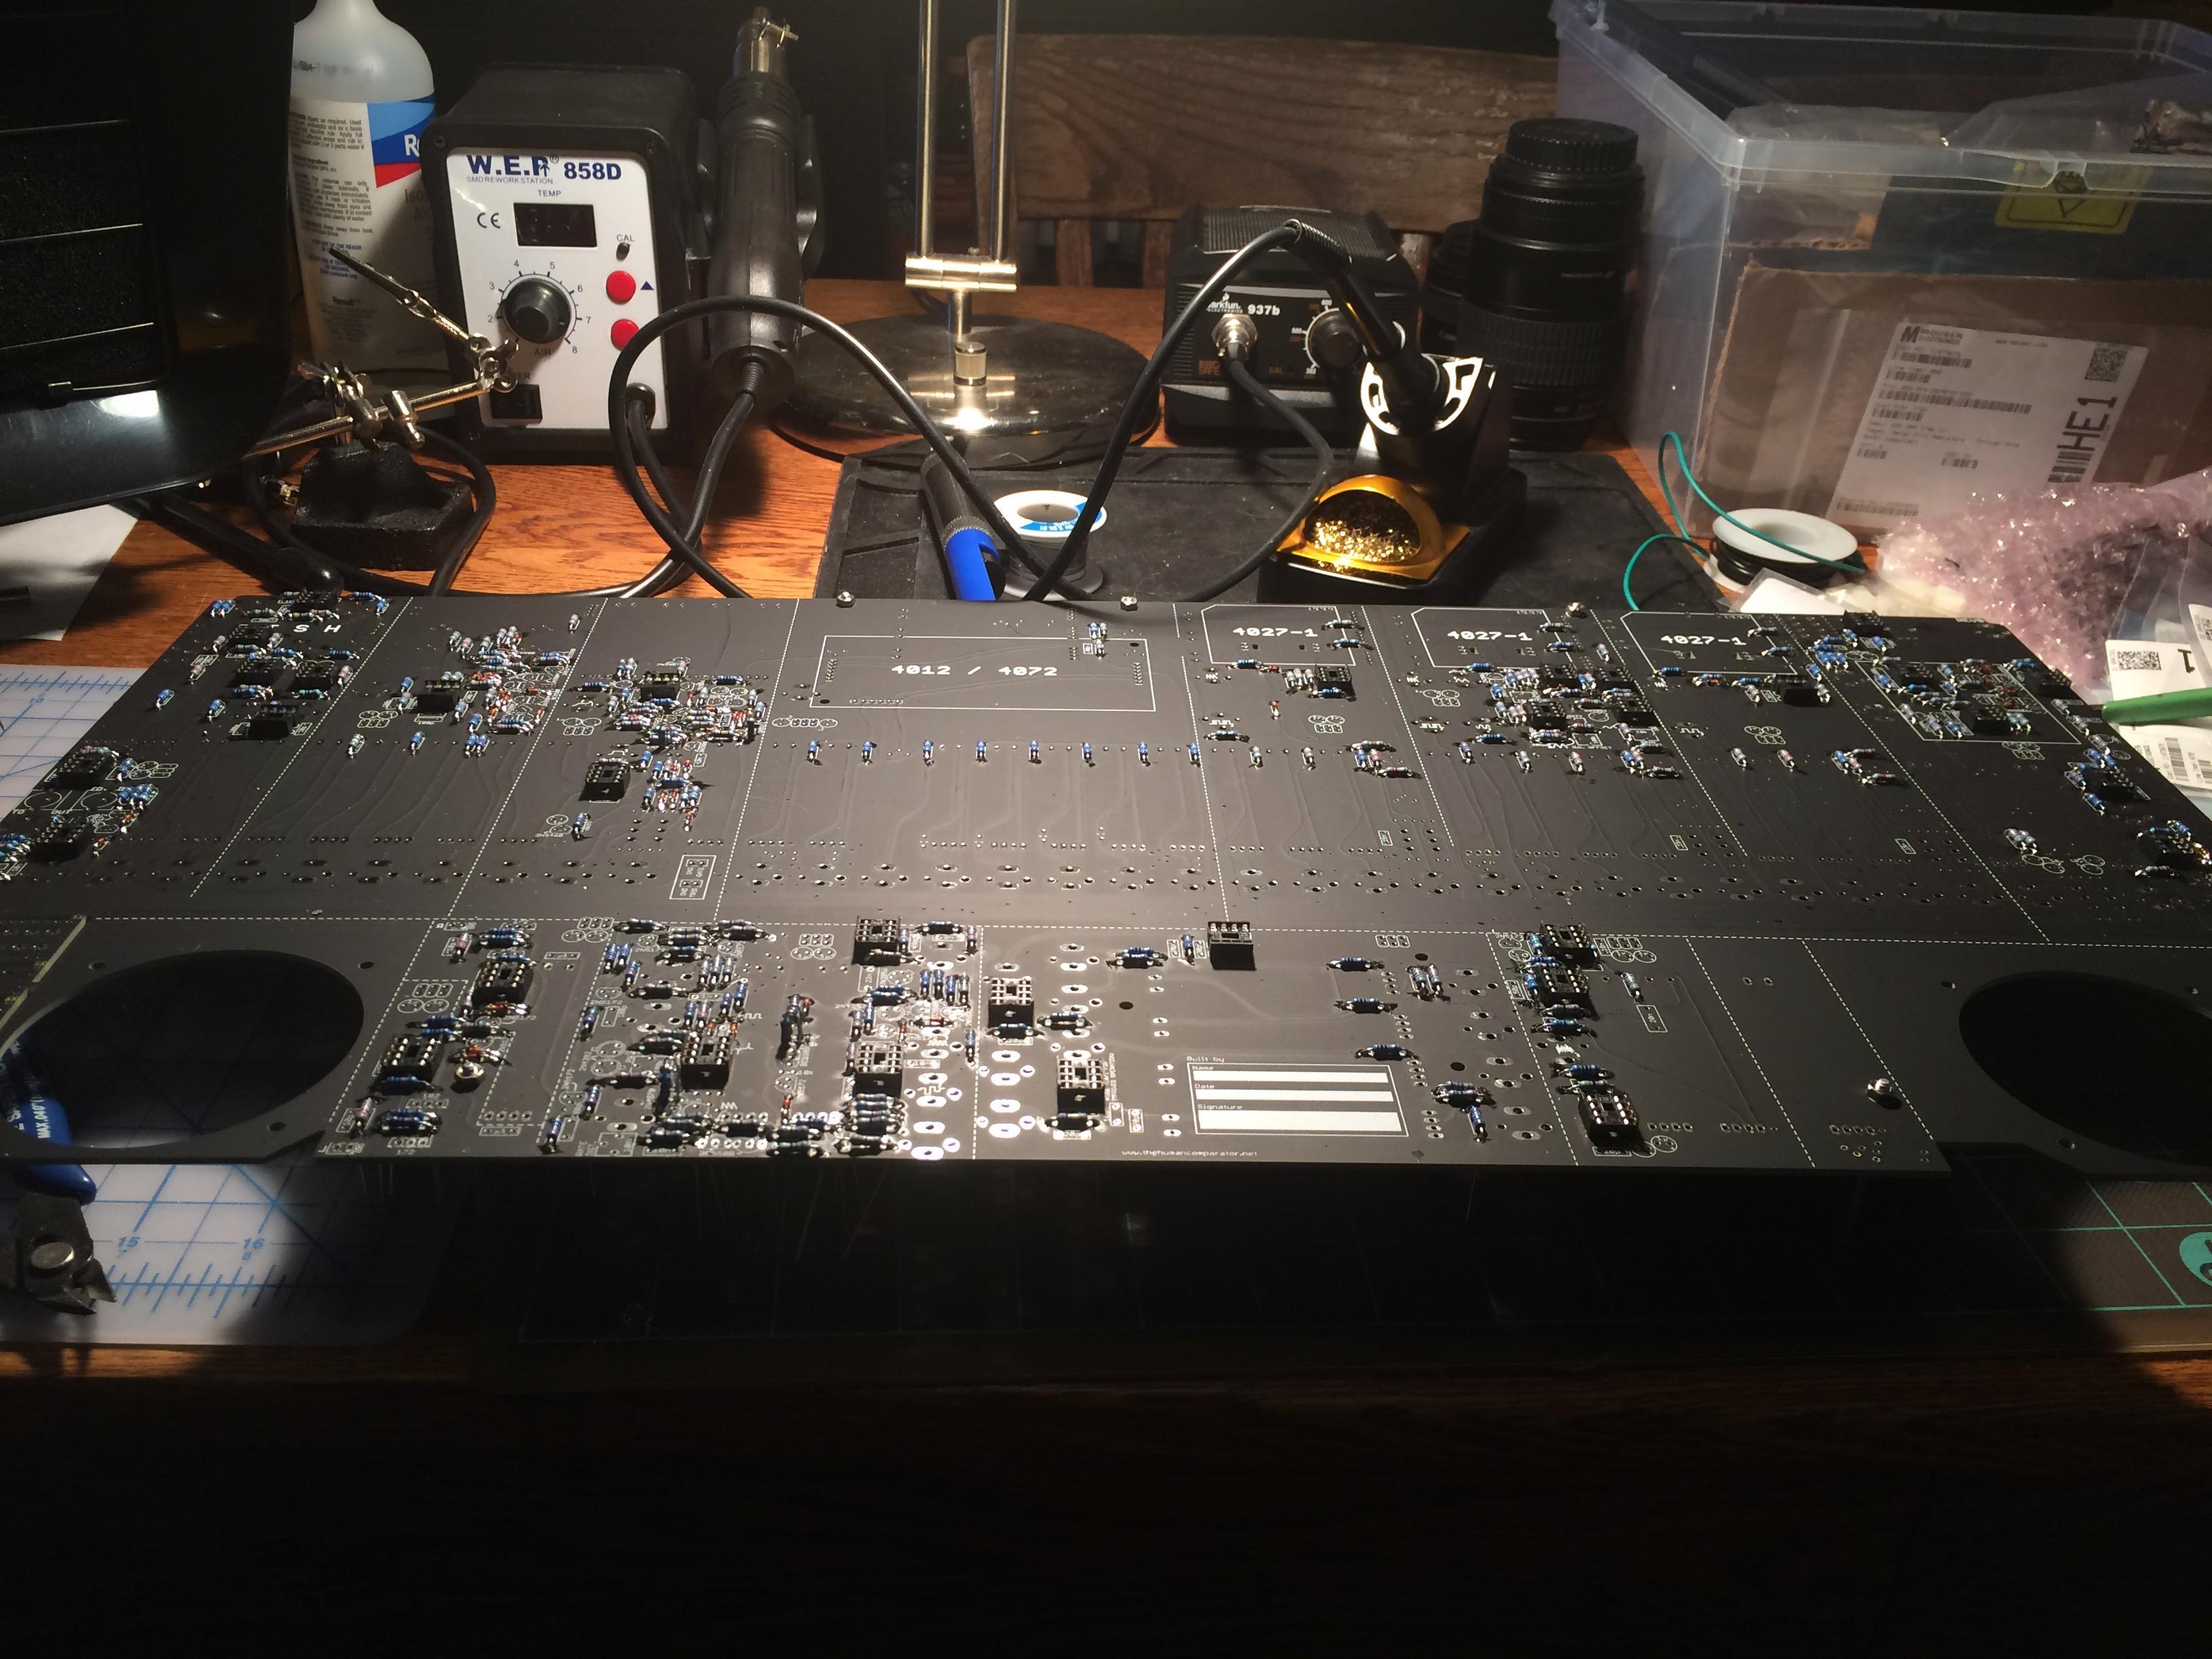 TTSH mainboard partially stuffed